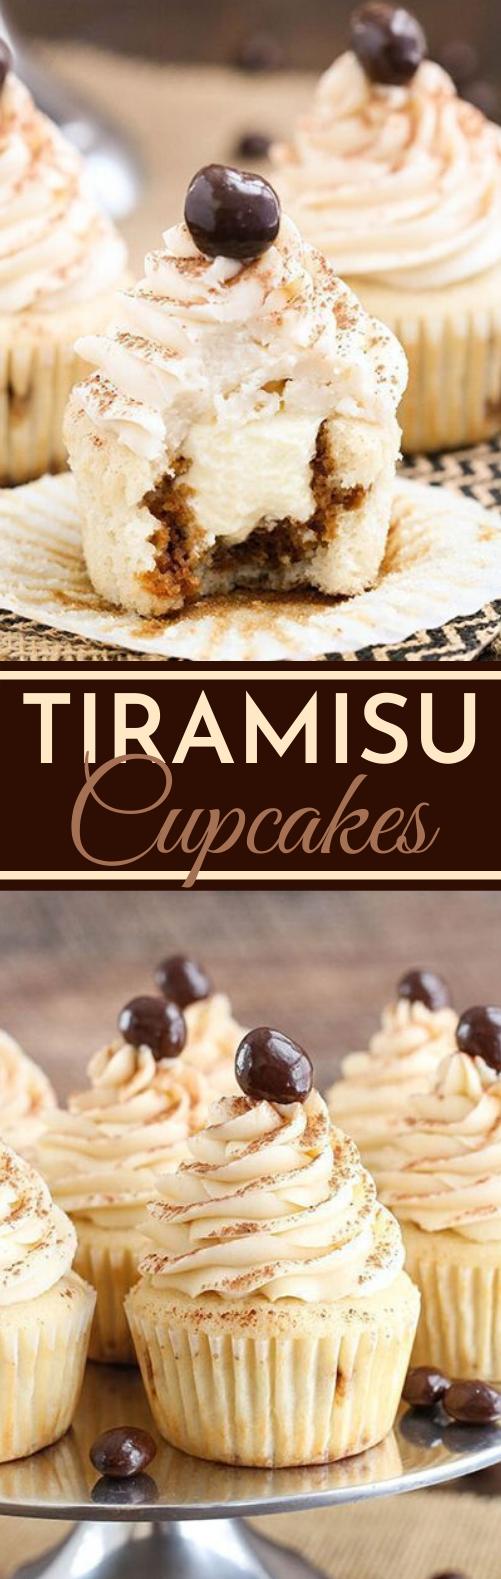 Tiramisu Cupcakes #cake #desserts #baking #cupcakes #recipes